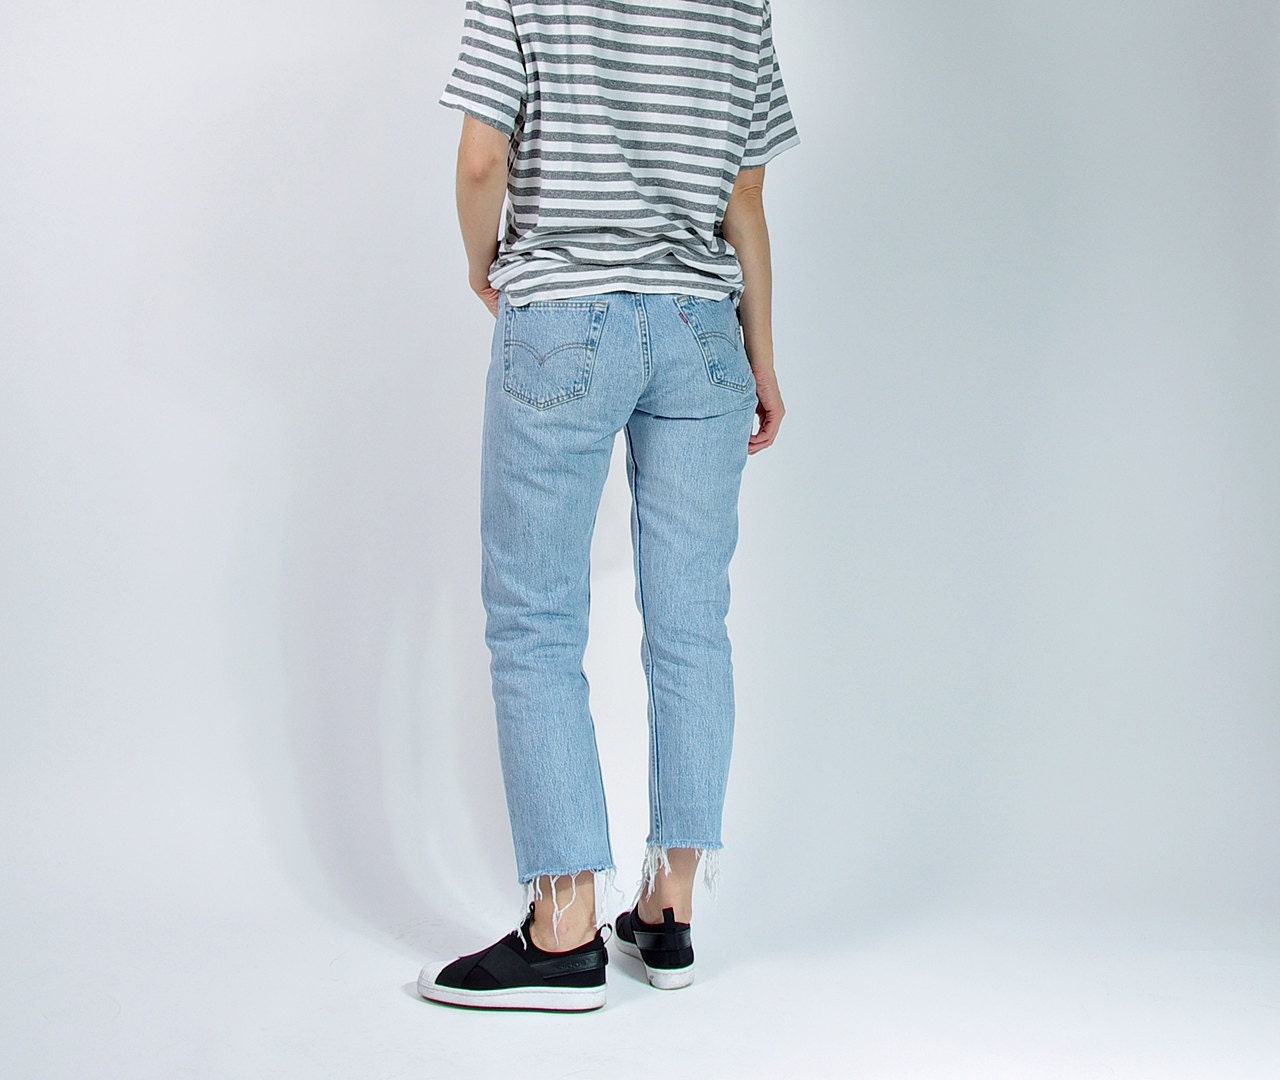 vintage levis 501 roh geschnittene damen jeans made in usa. Black Bedroom Furniture Sets. Home Design Ideas